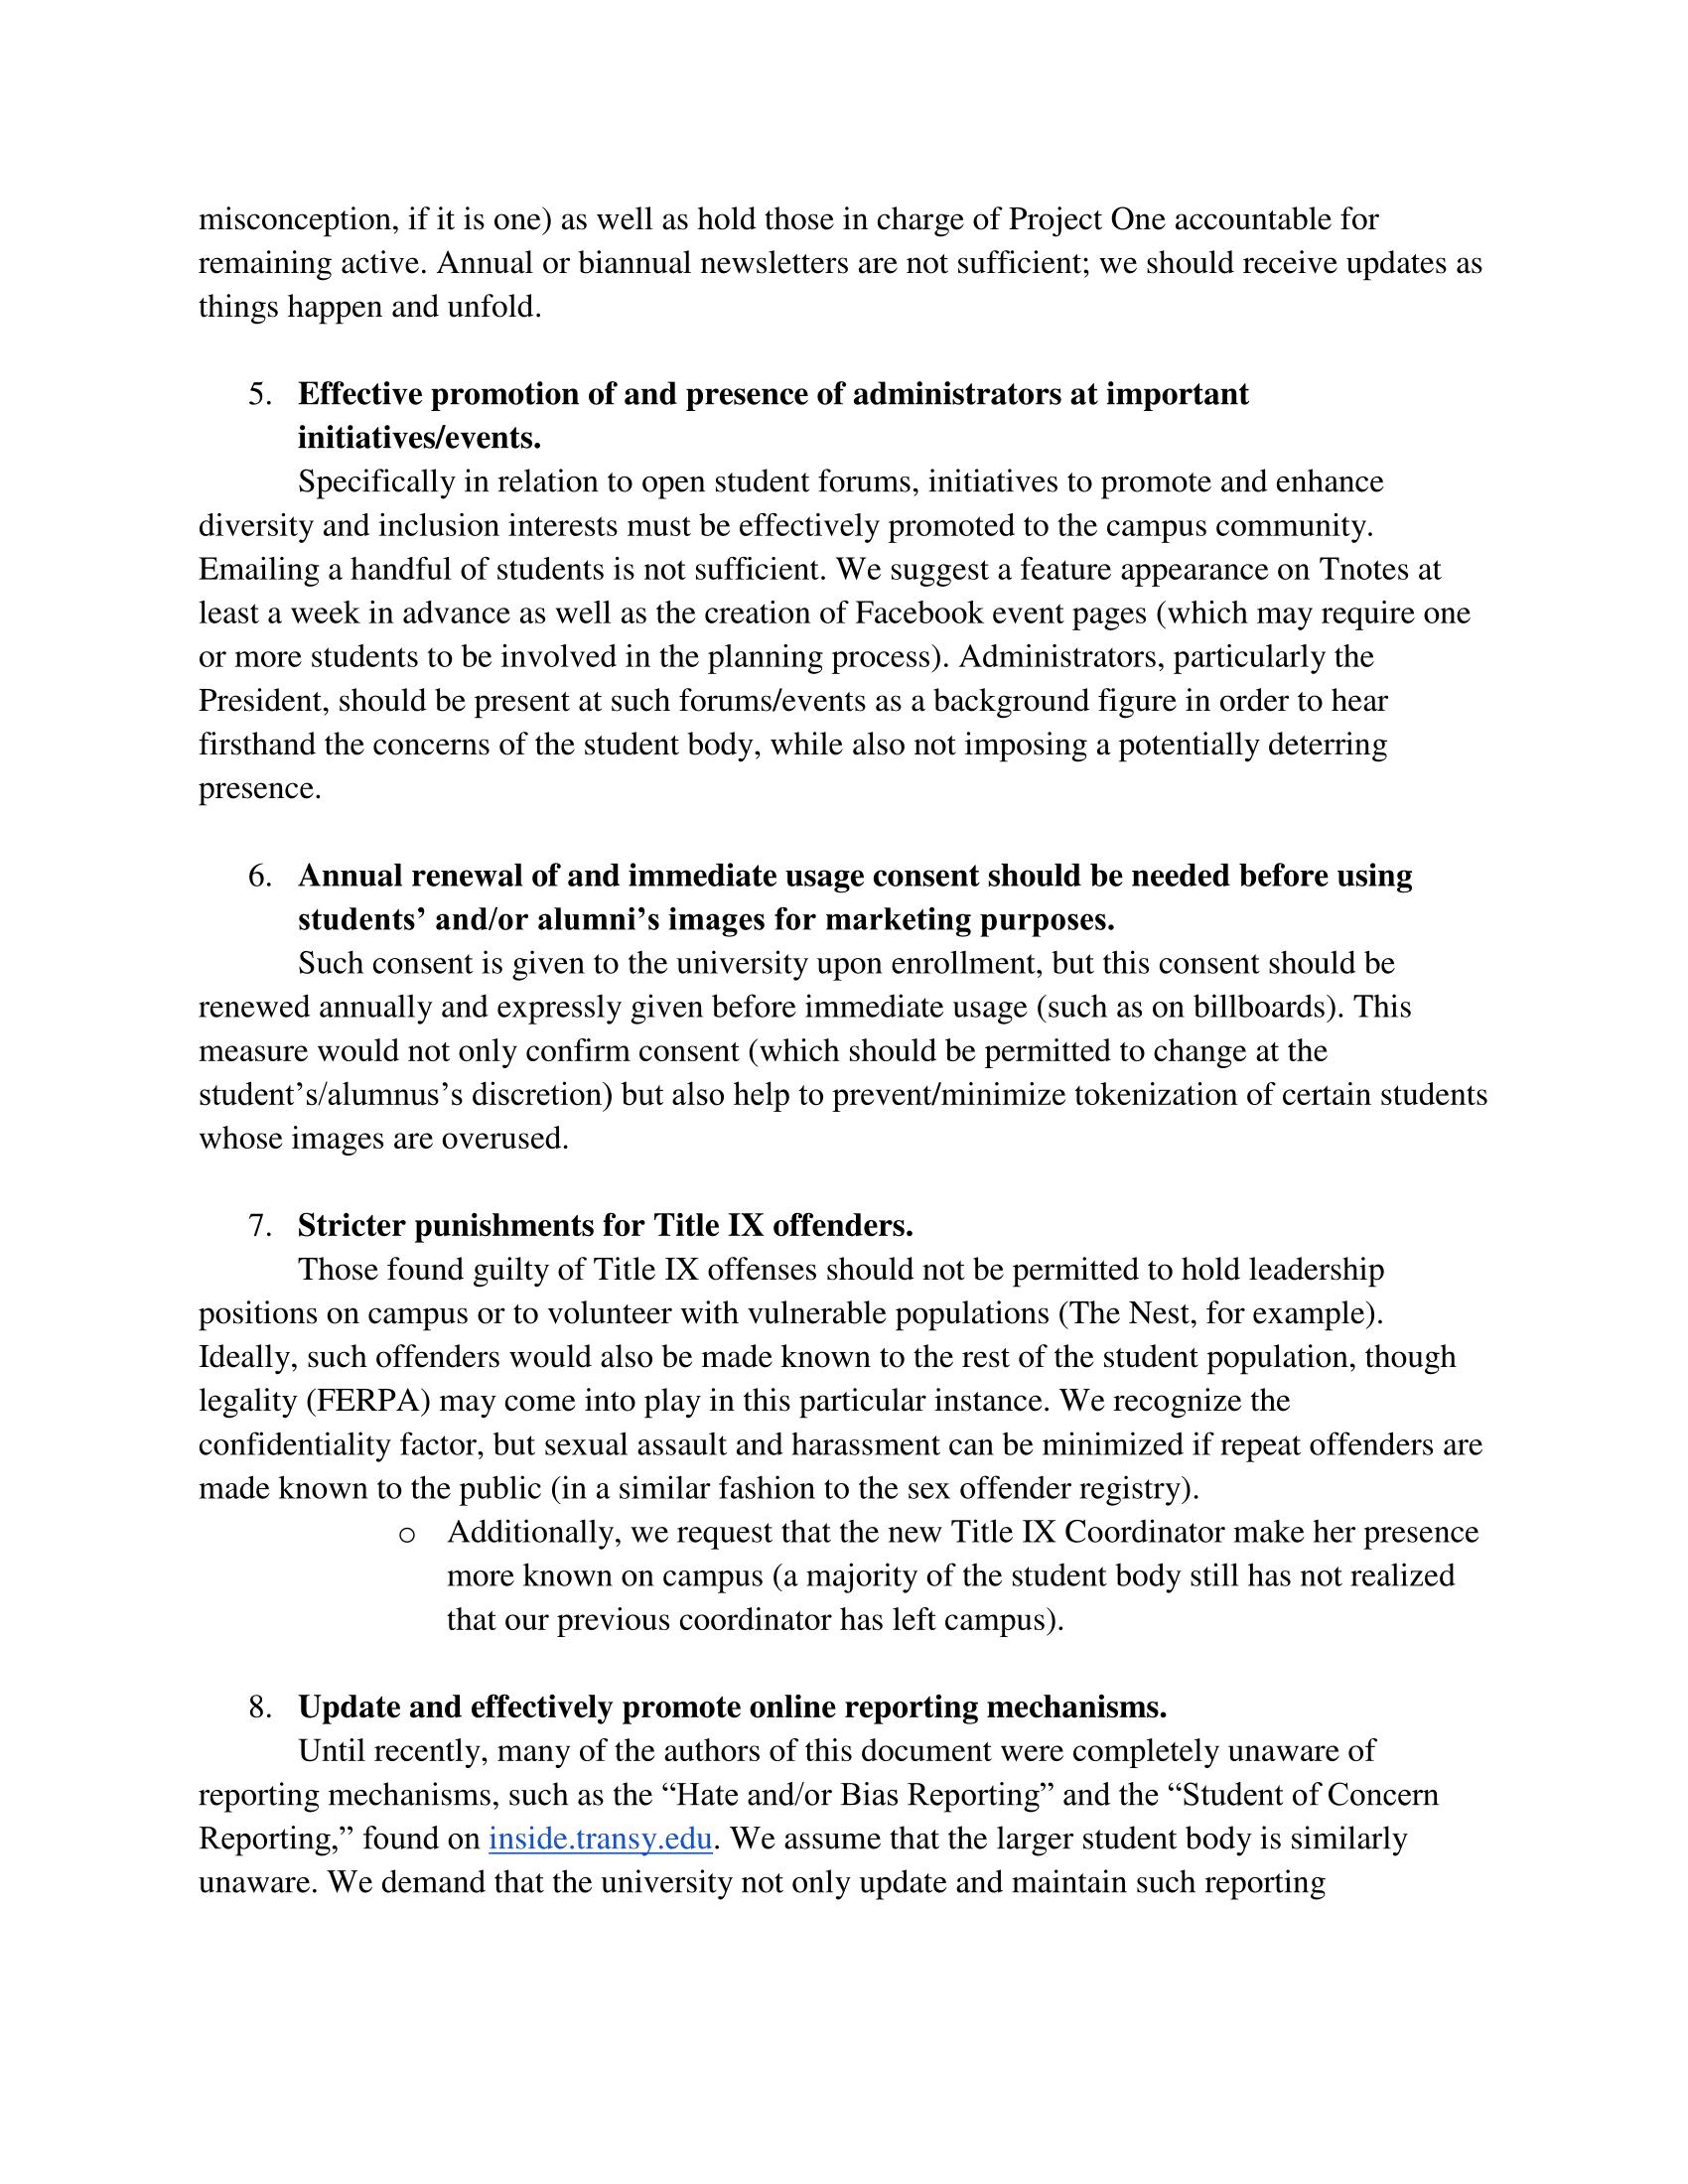 Demonstrators' list of demands, page 2